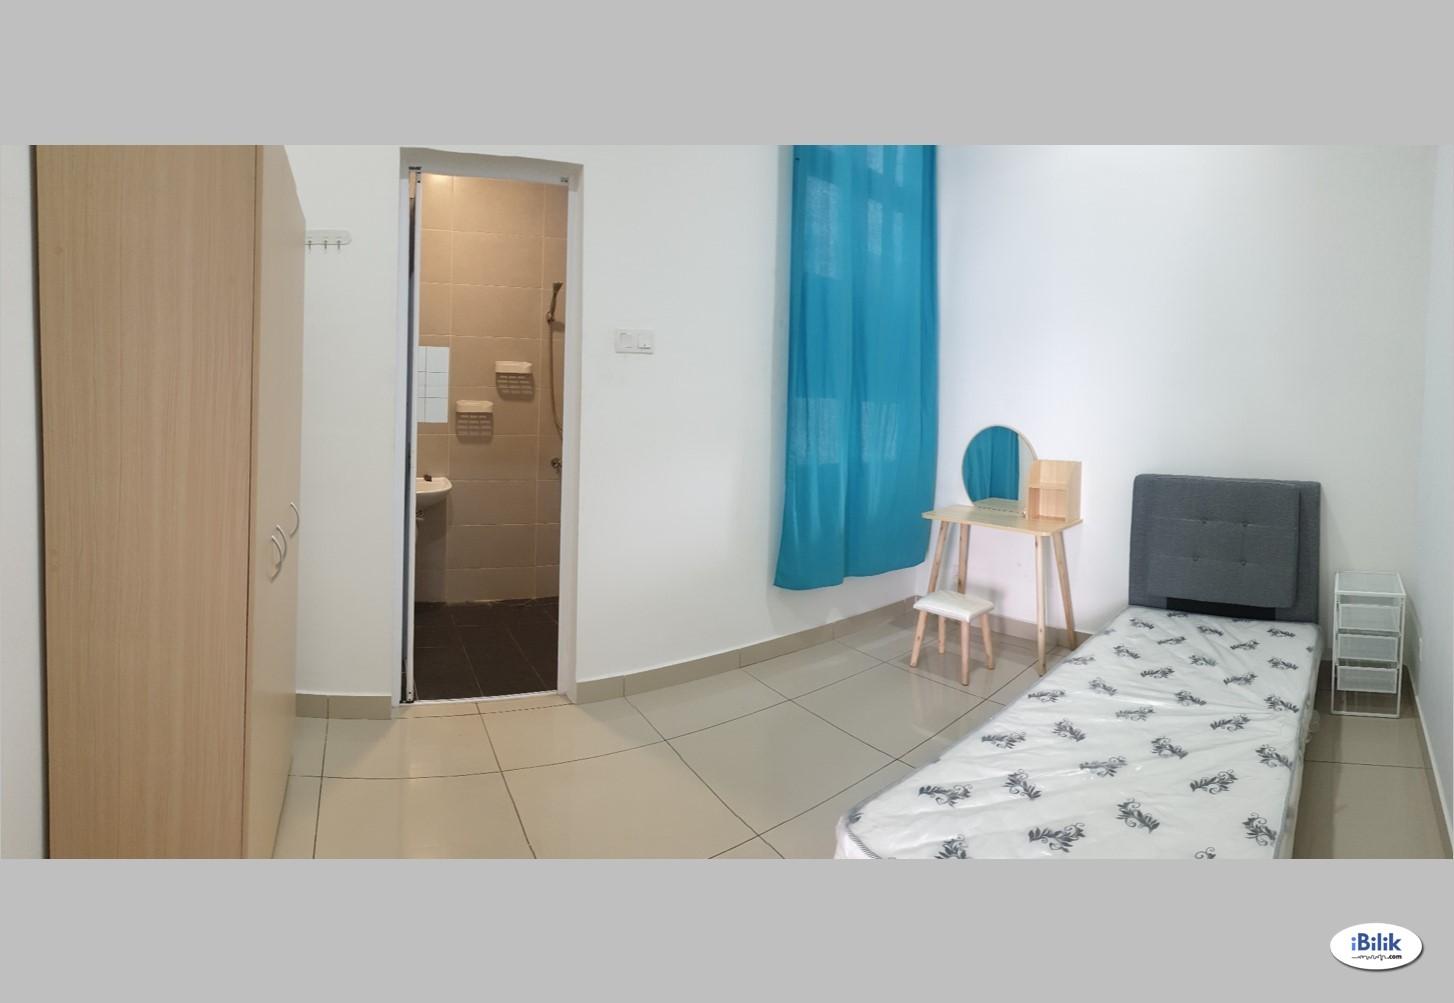 Master Room BM City Mall Condo, Bandar Perda, Bukit Mertajam, Surrounded with Good Facilities & Amenities